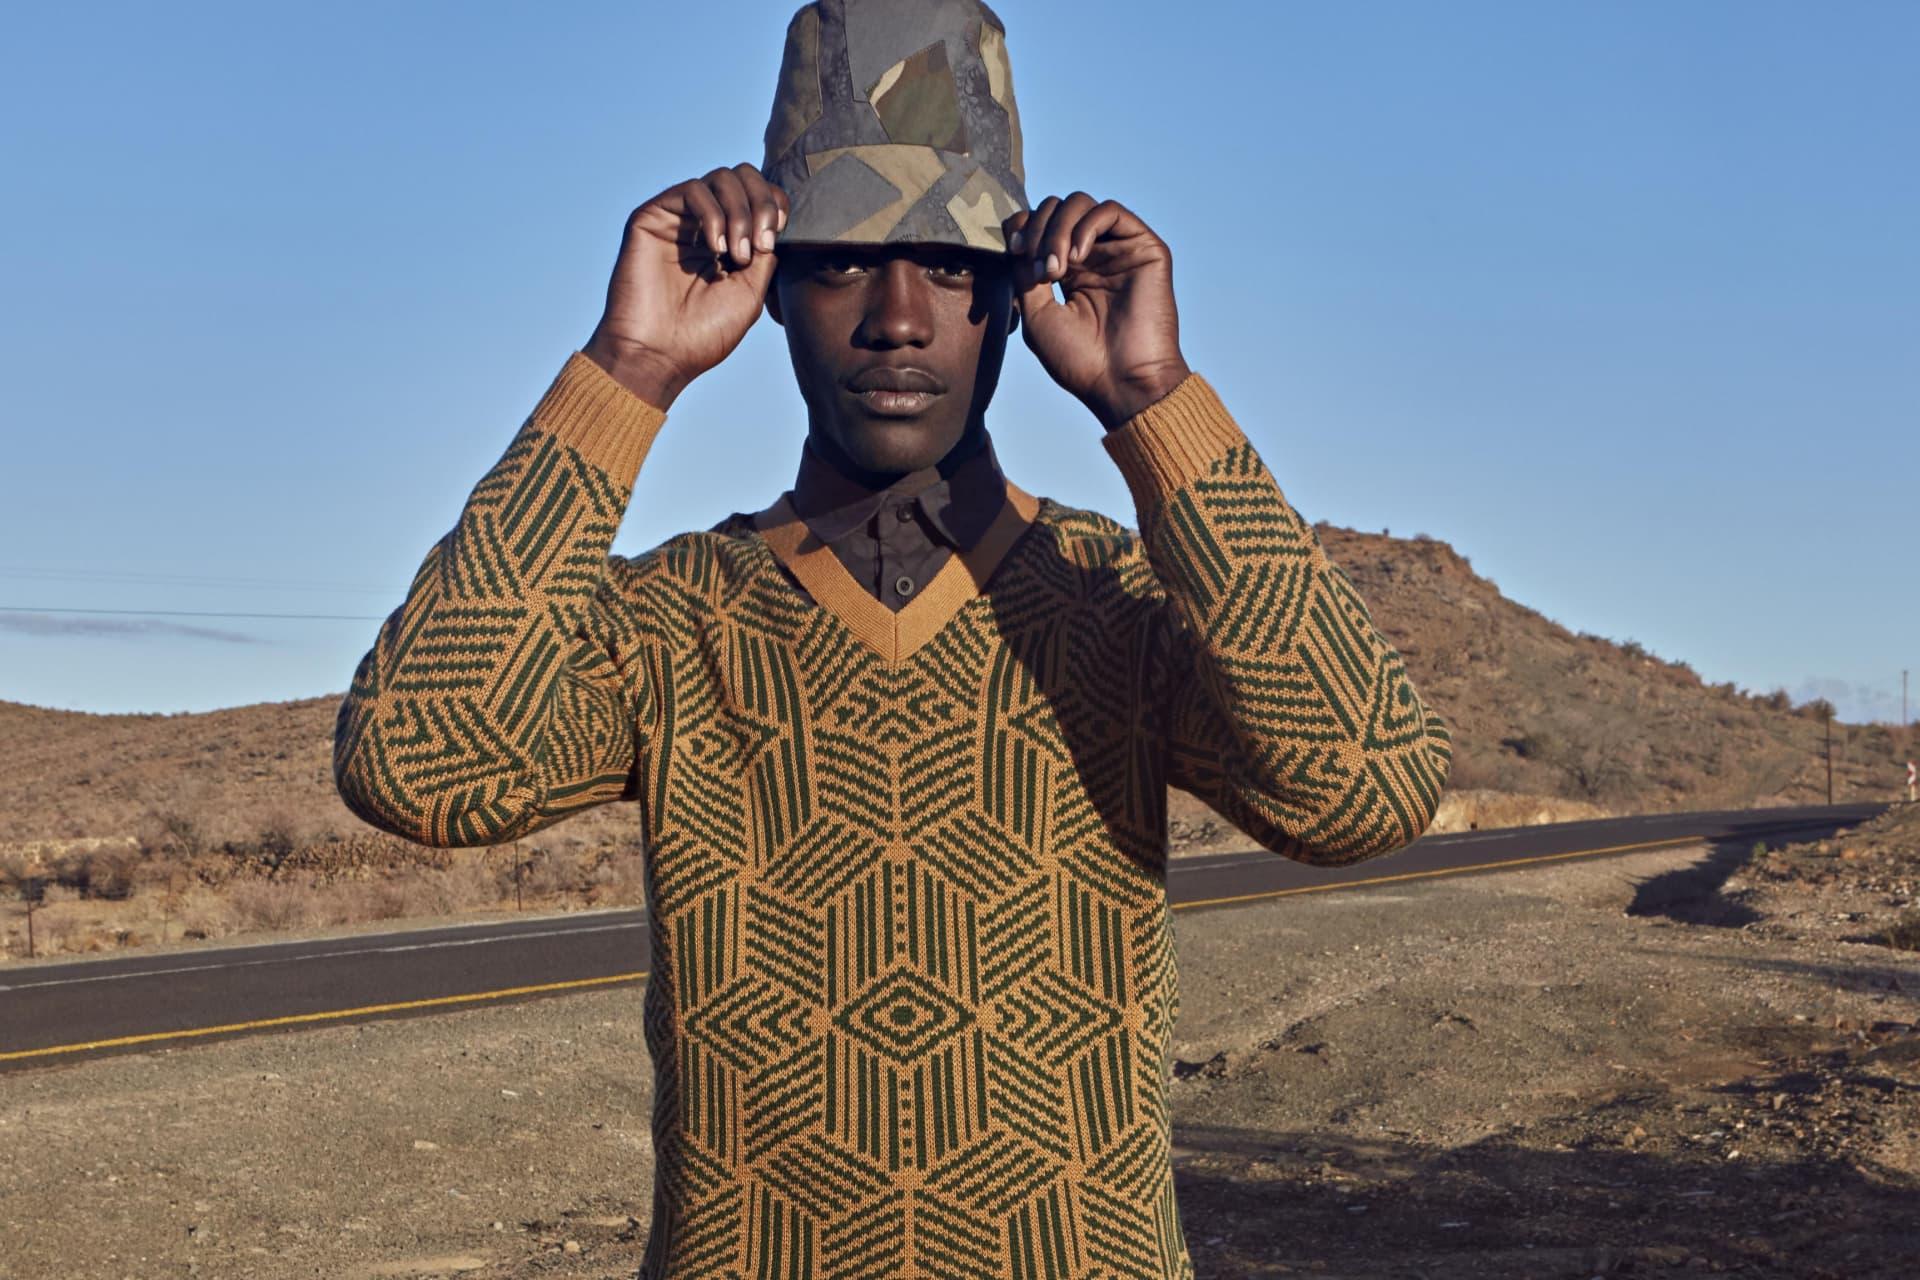 ALC Menswear camo Shweshwe bucket hat. ALC Menswear Shweshwe shirt. Chulaap Shweshwe knit.